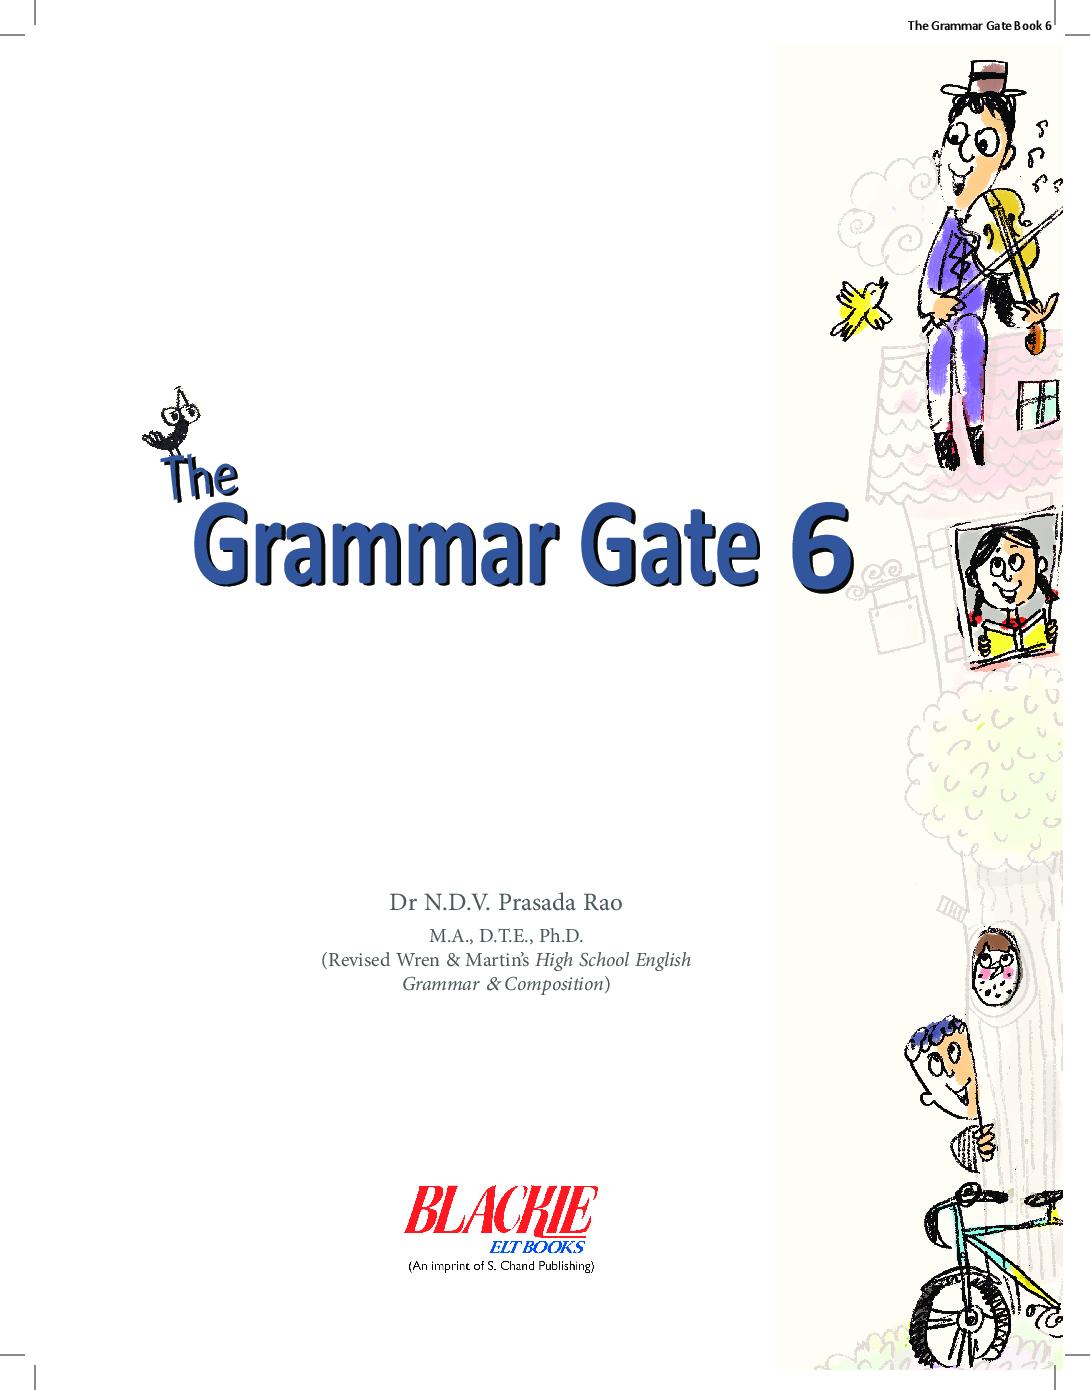 The Grammar Gate Book 6 - Page 2